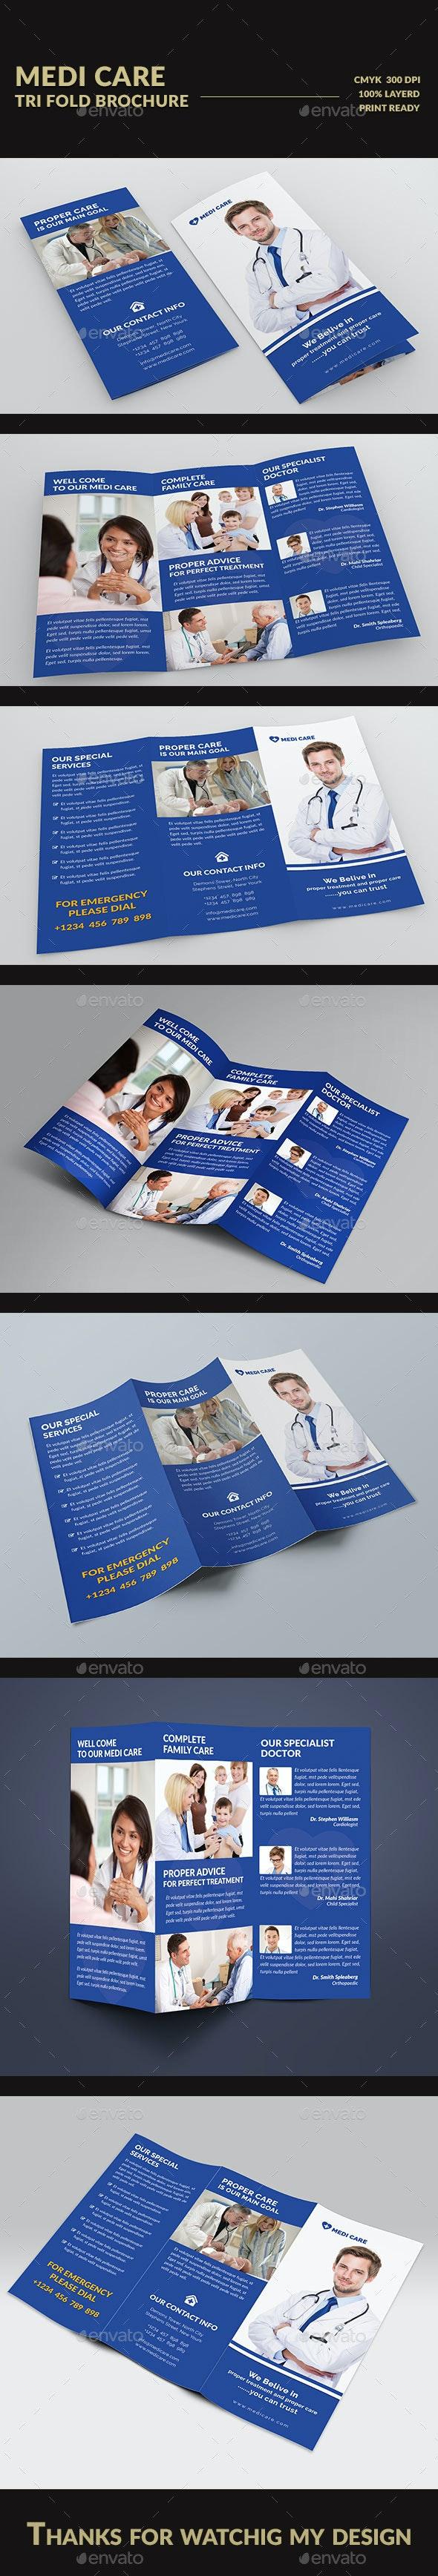 Medi Care  Tri fold Brochure - Brochures Print Templates